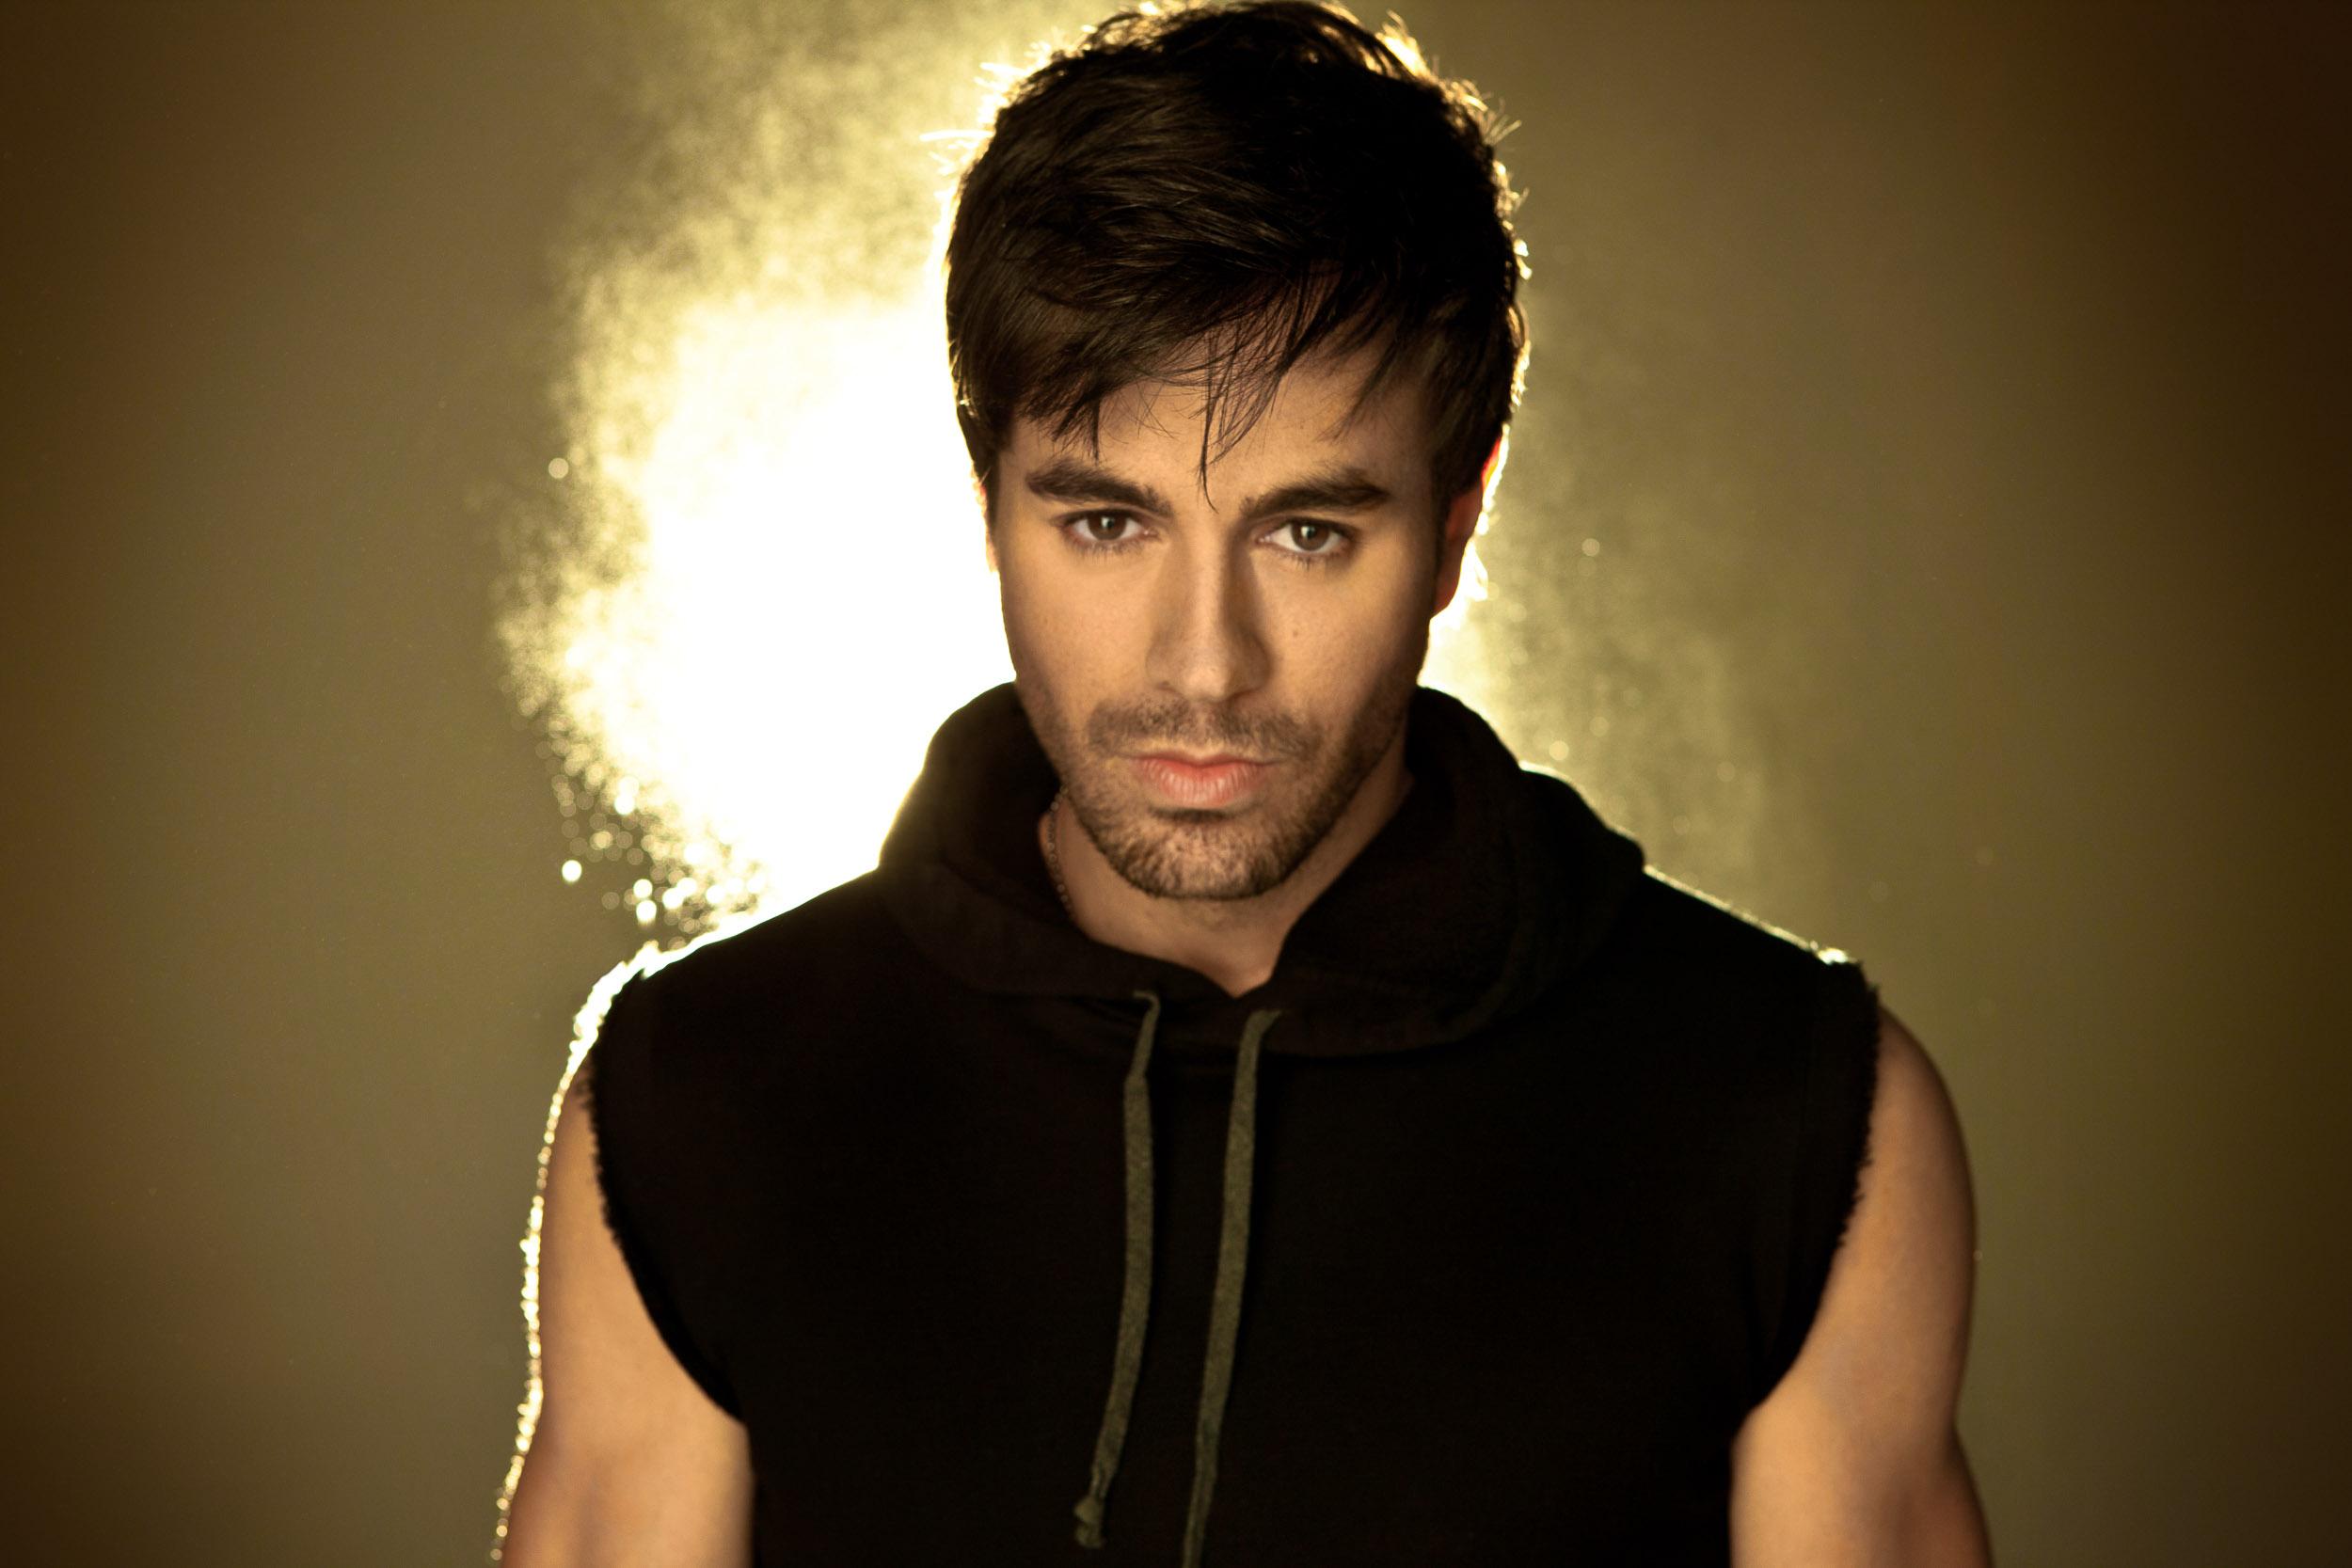 Enrique_Iglesias-Chapman_Baehler11.jpg